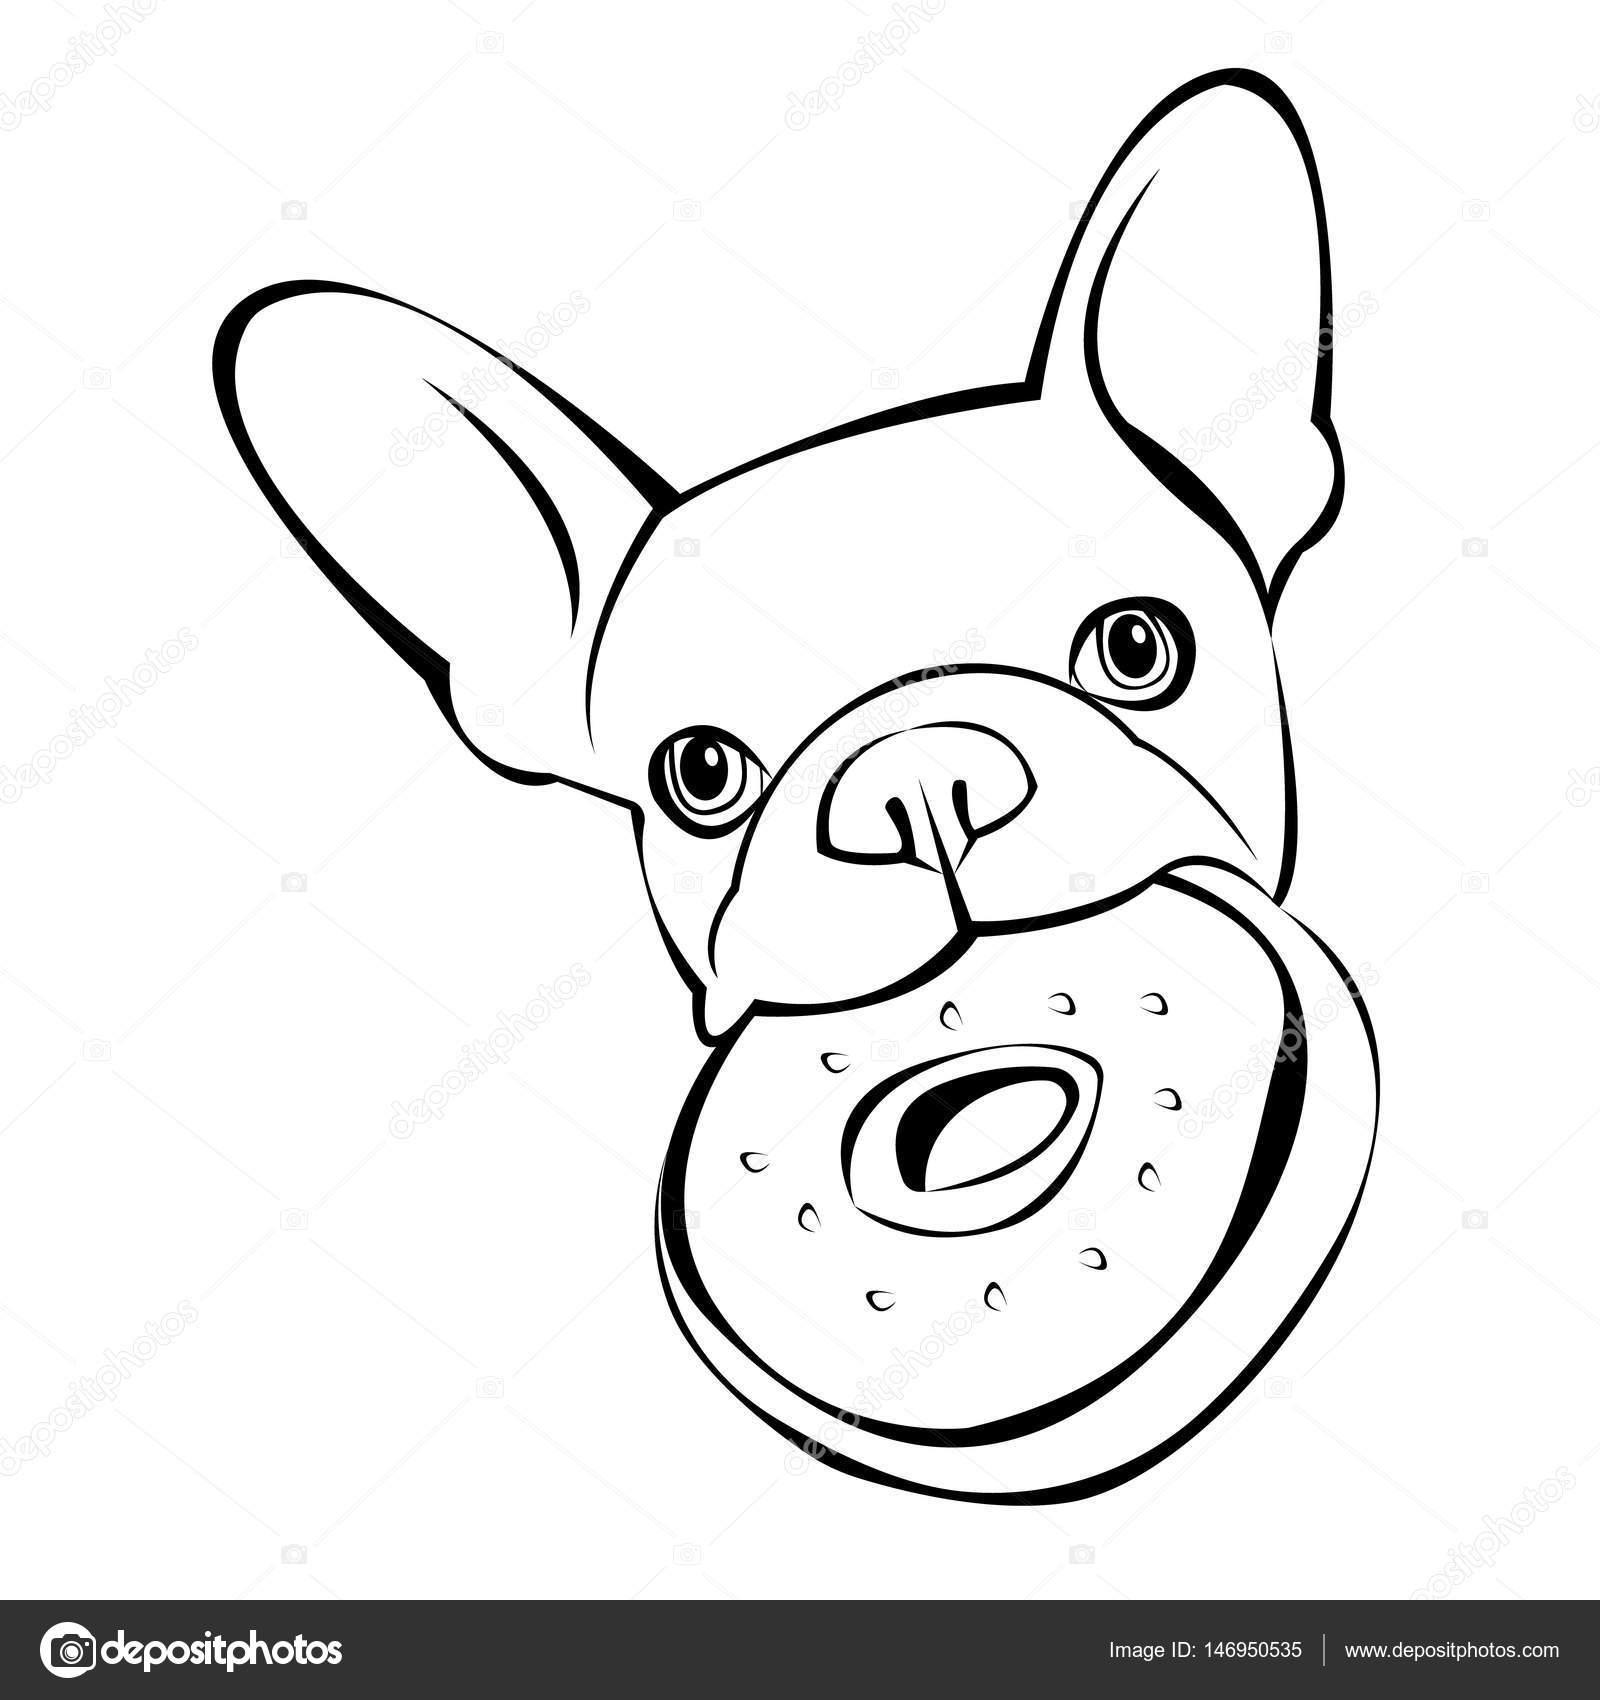 Volwassen Kleurplater Dieren Kleurplaat Cute Hond Puppies Makkelijk Bulldog Hond Dier